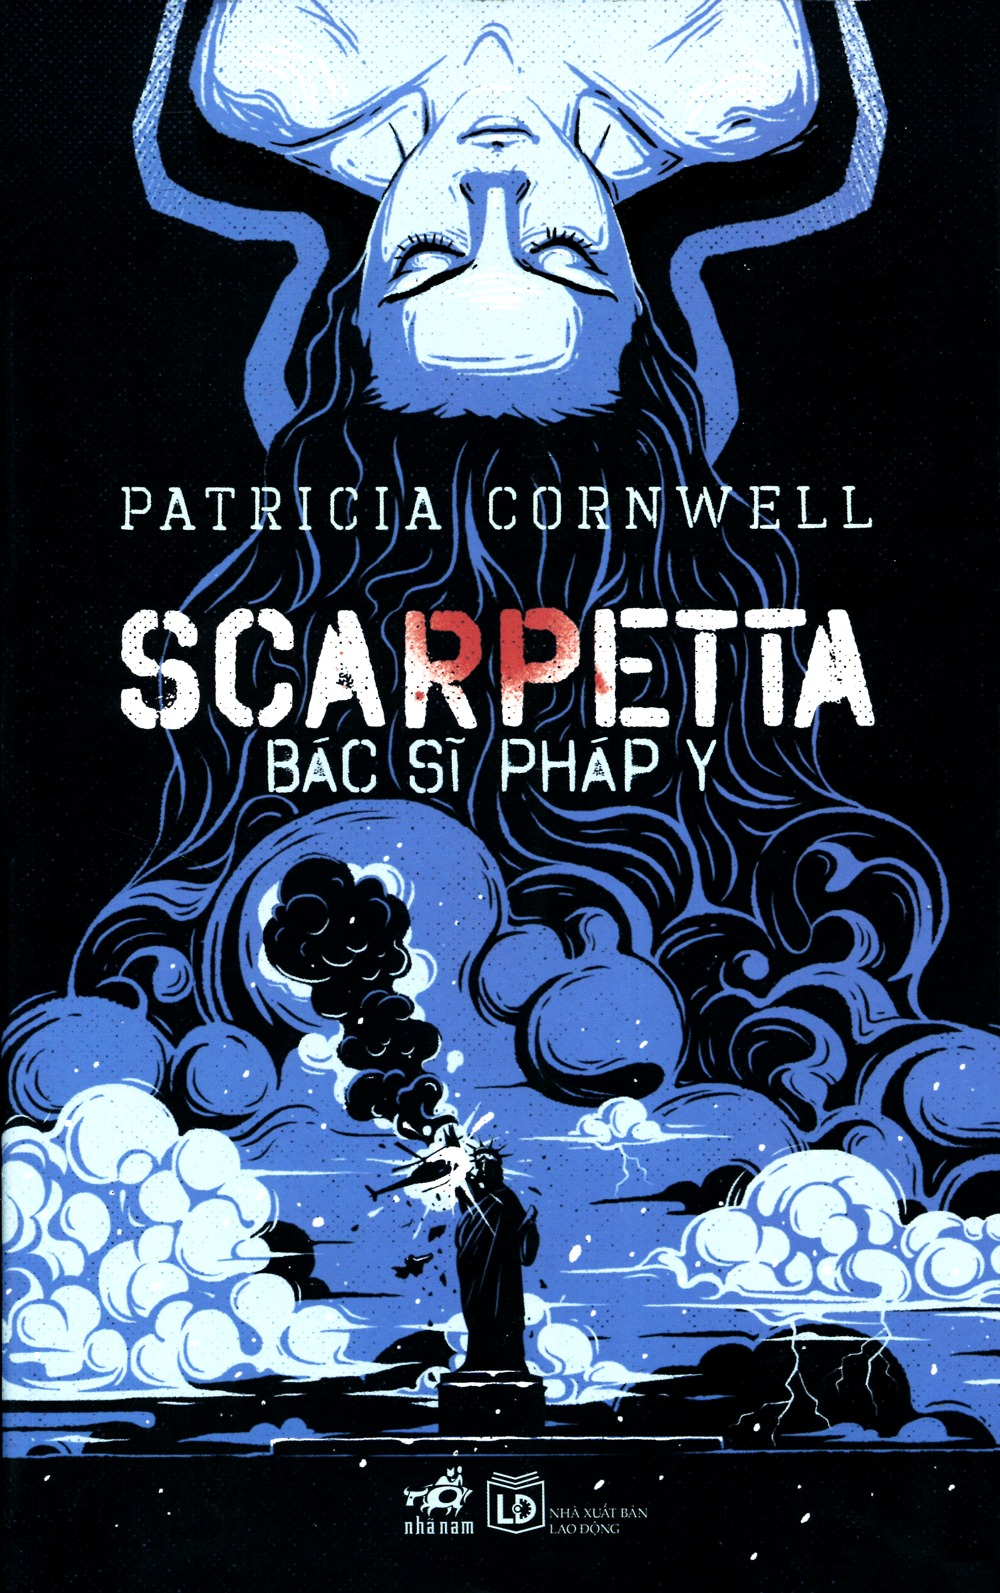 Scarpetta - Bác Sĩ Pháp Y (Kay Scarpetta, #7) Patricia Cornwell